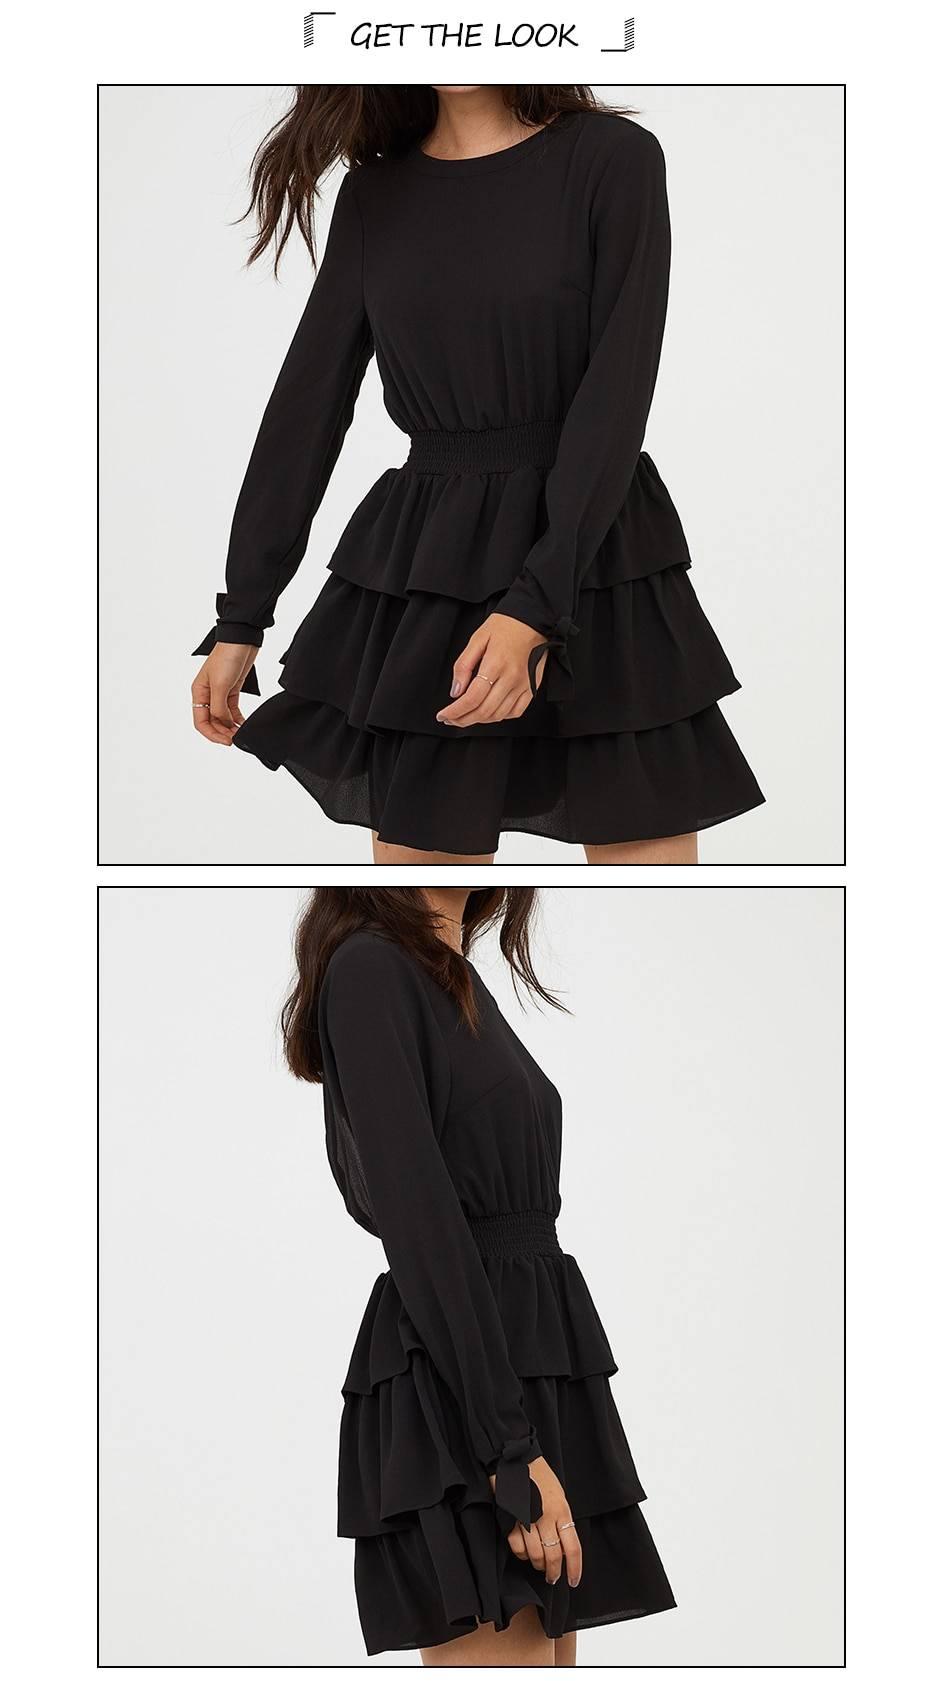 Black a-line high waist round neck ruffle bow tie backless mini dress